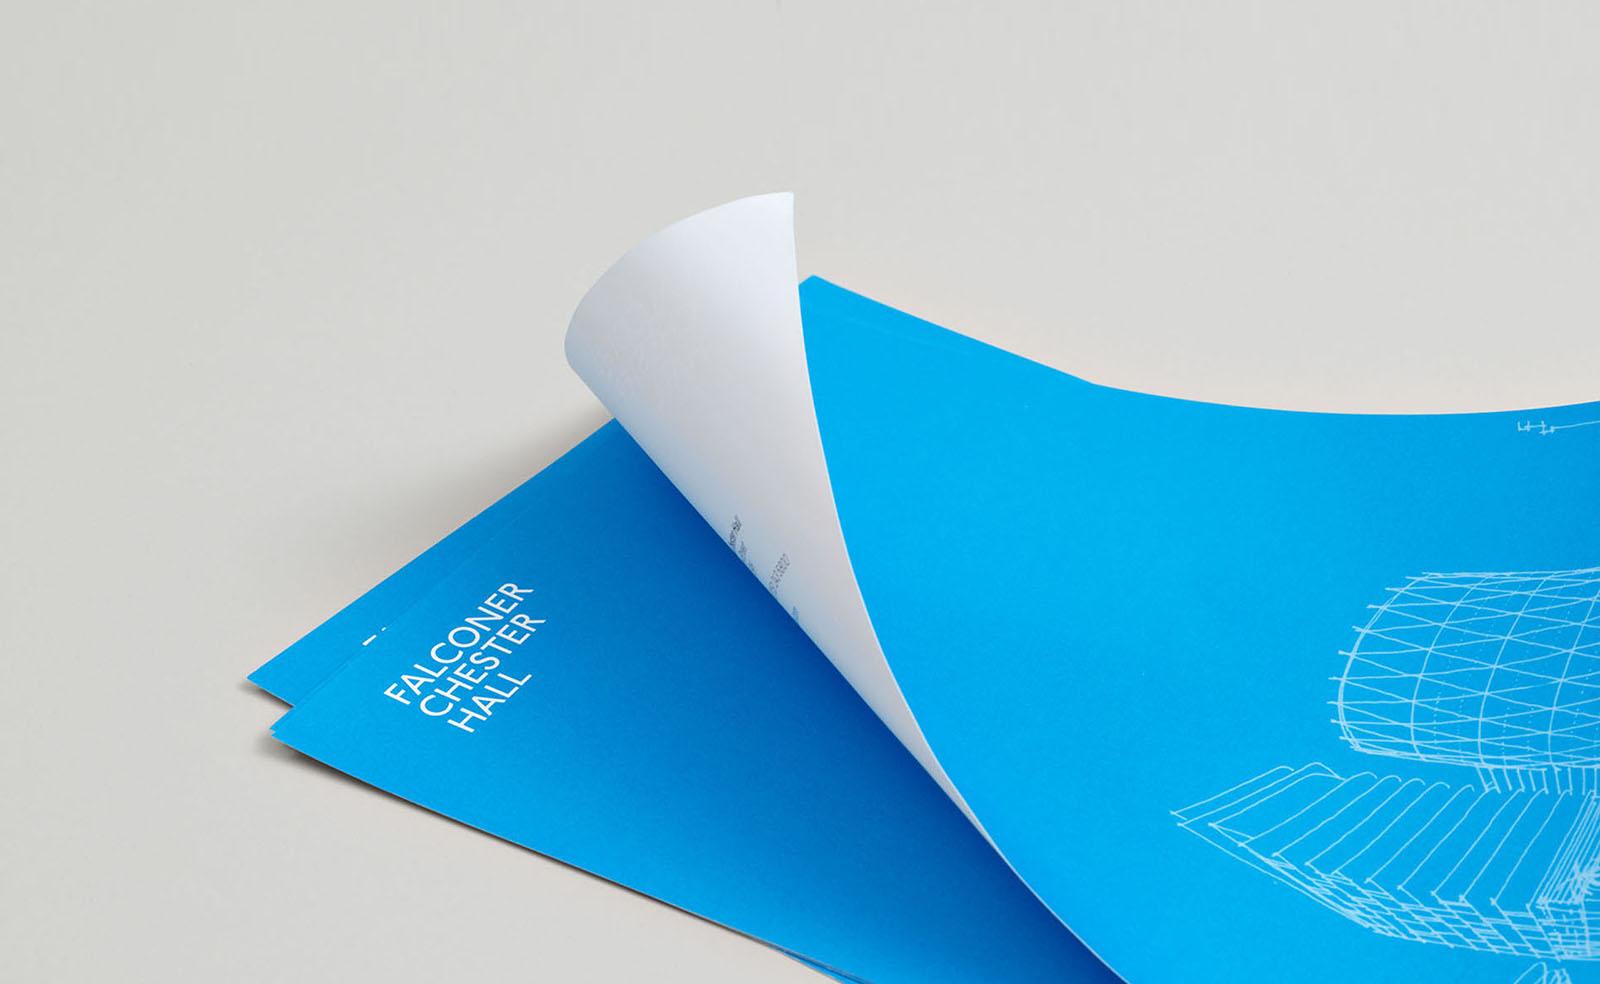 falconer chester hall stationery design by Leeds based Freelance Designer Neil Holroyd